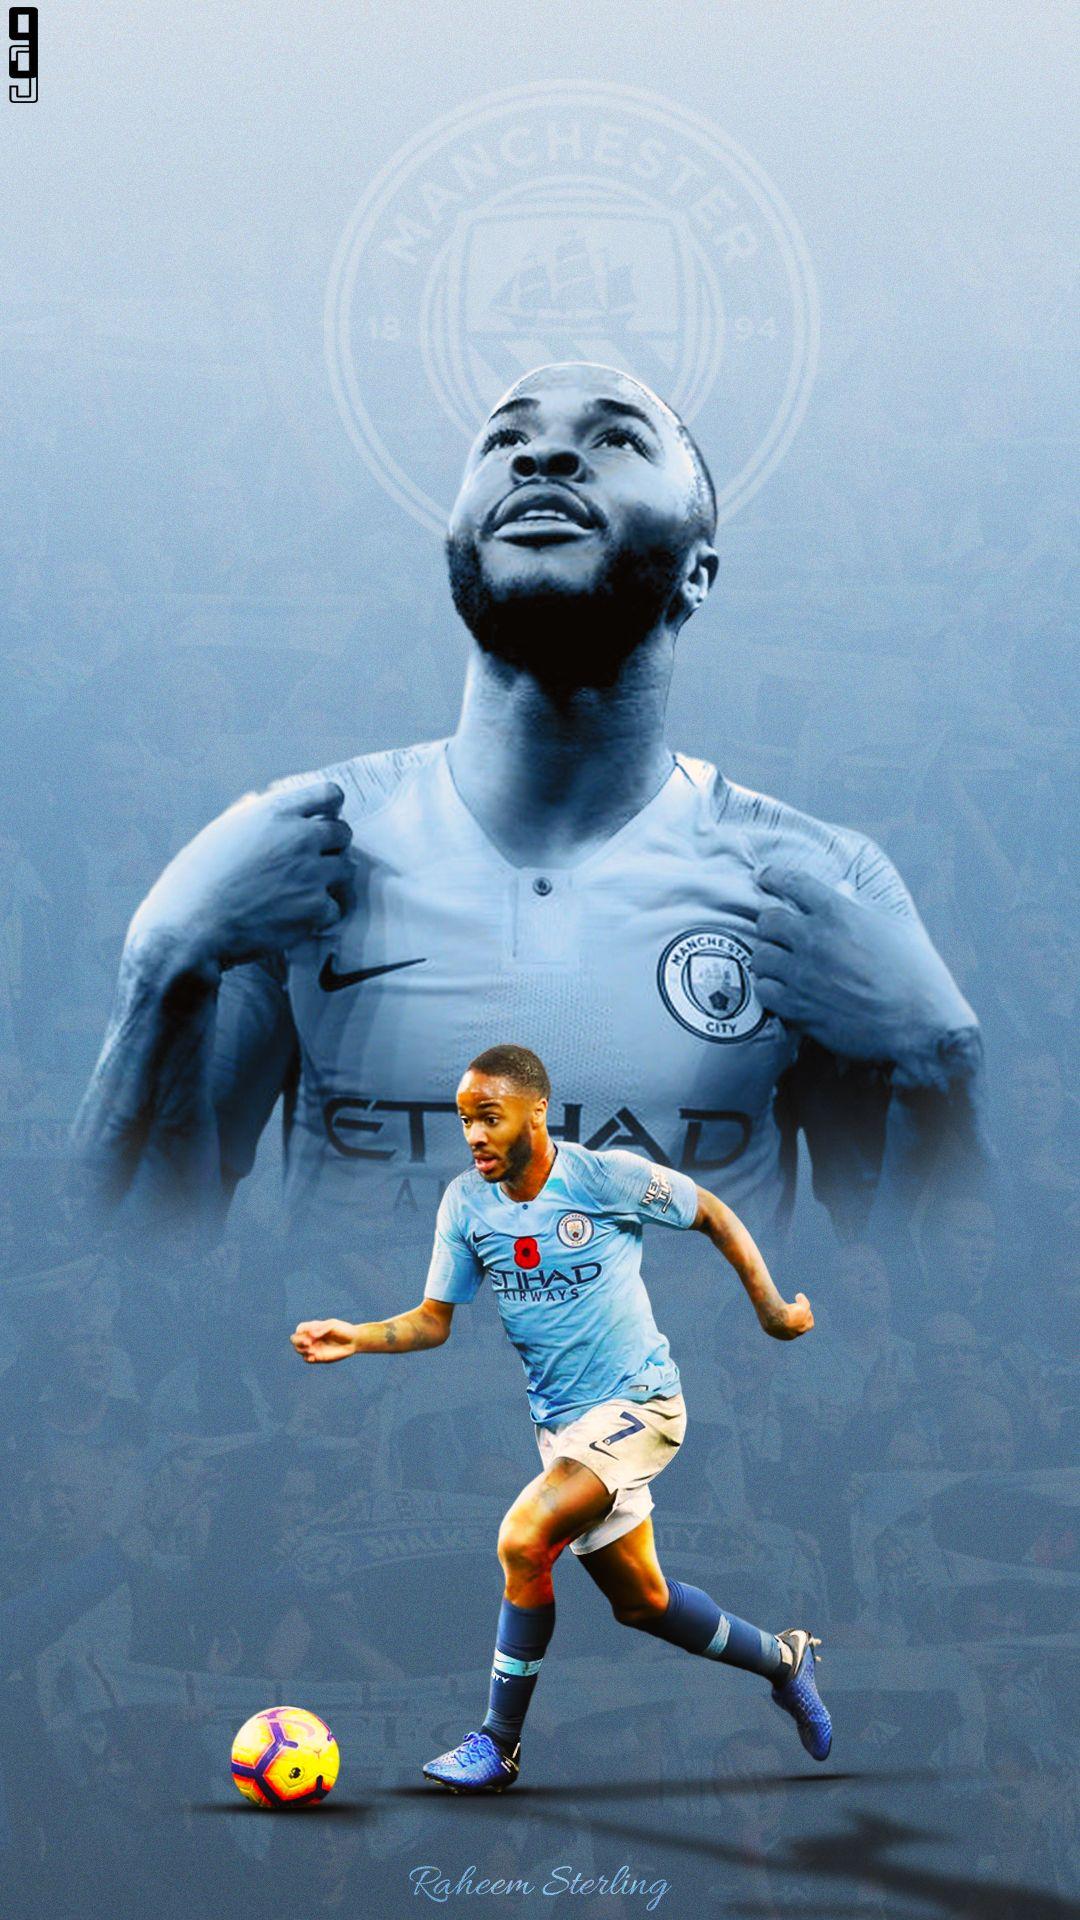 Raheem Sterling Manchester City At Sterling7 X At Mancity